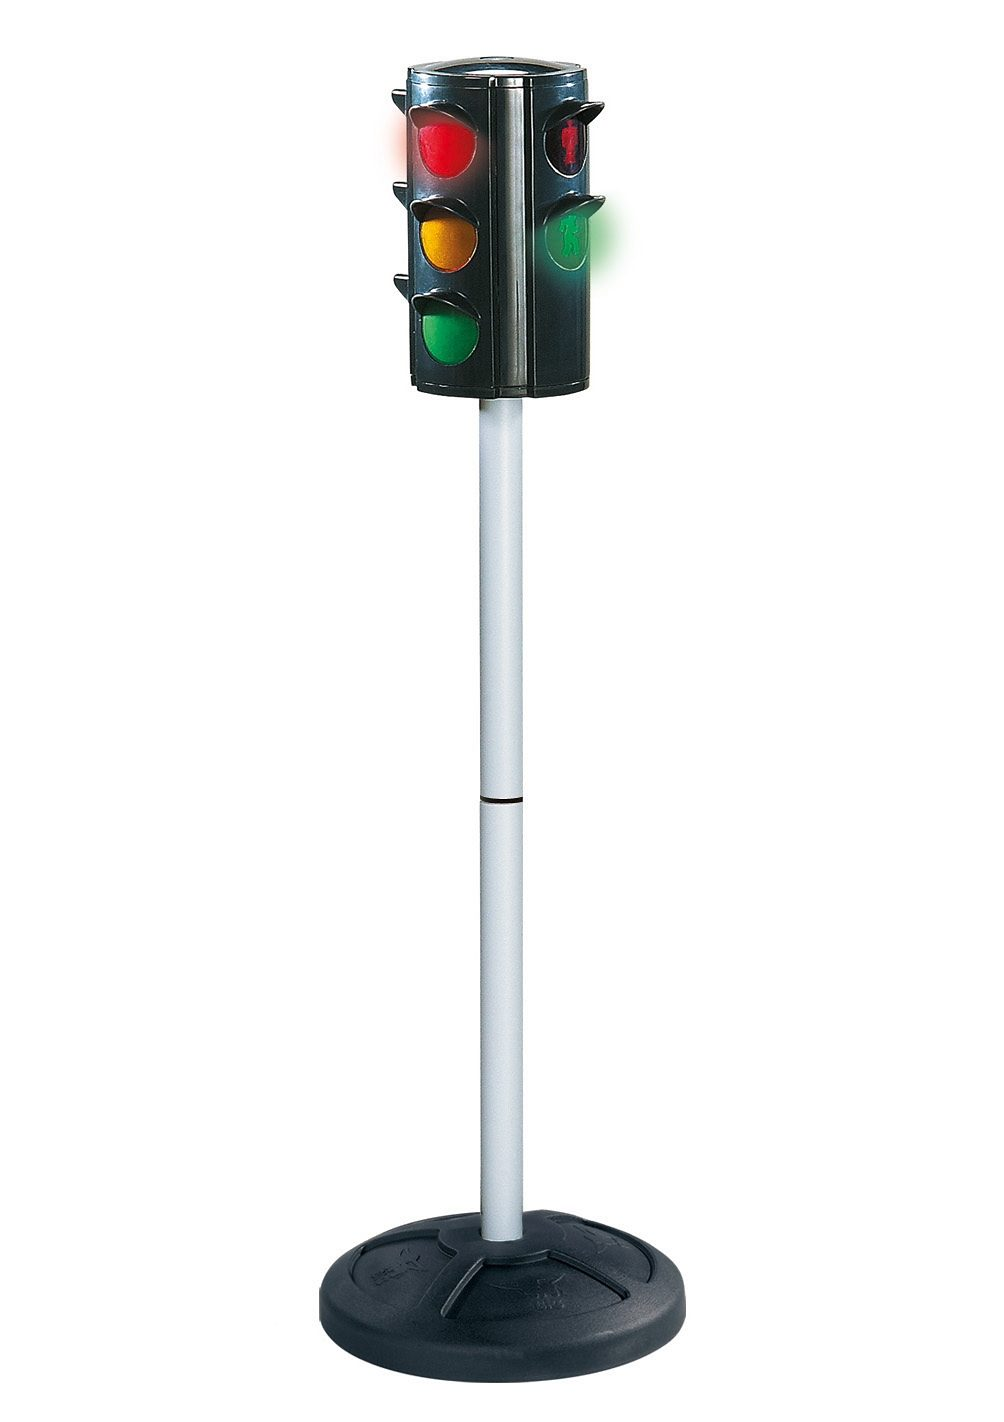 BIG Verkehrsampel mit selbstständigem Signalwechsel »BIG-Traffic-Lights«